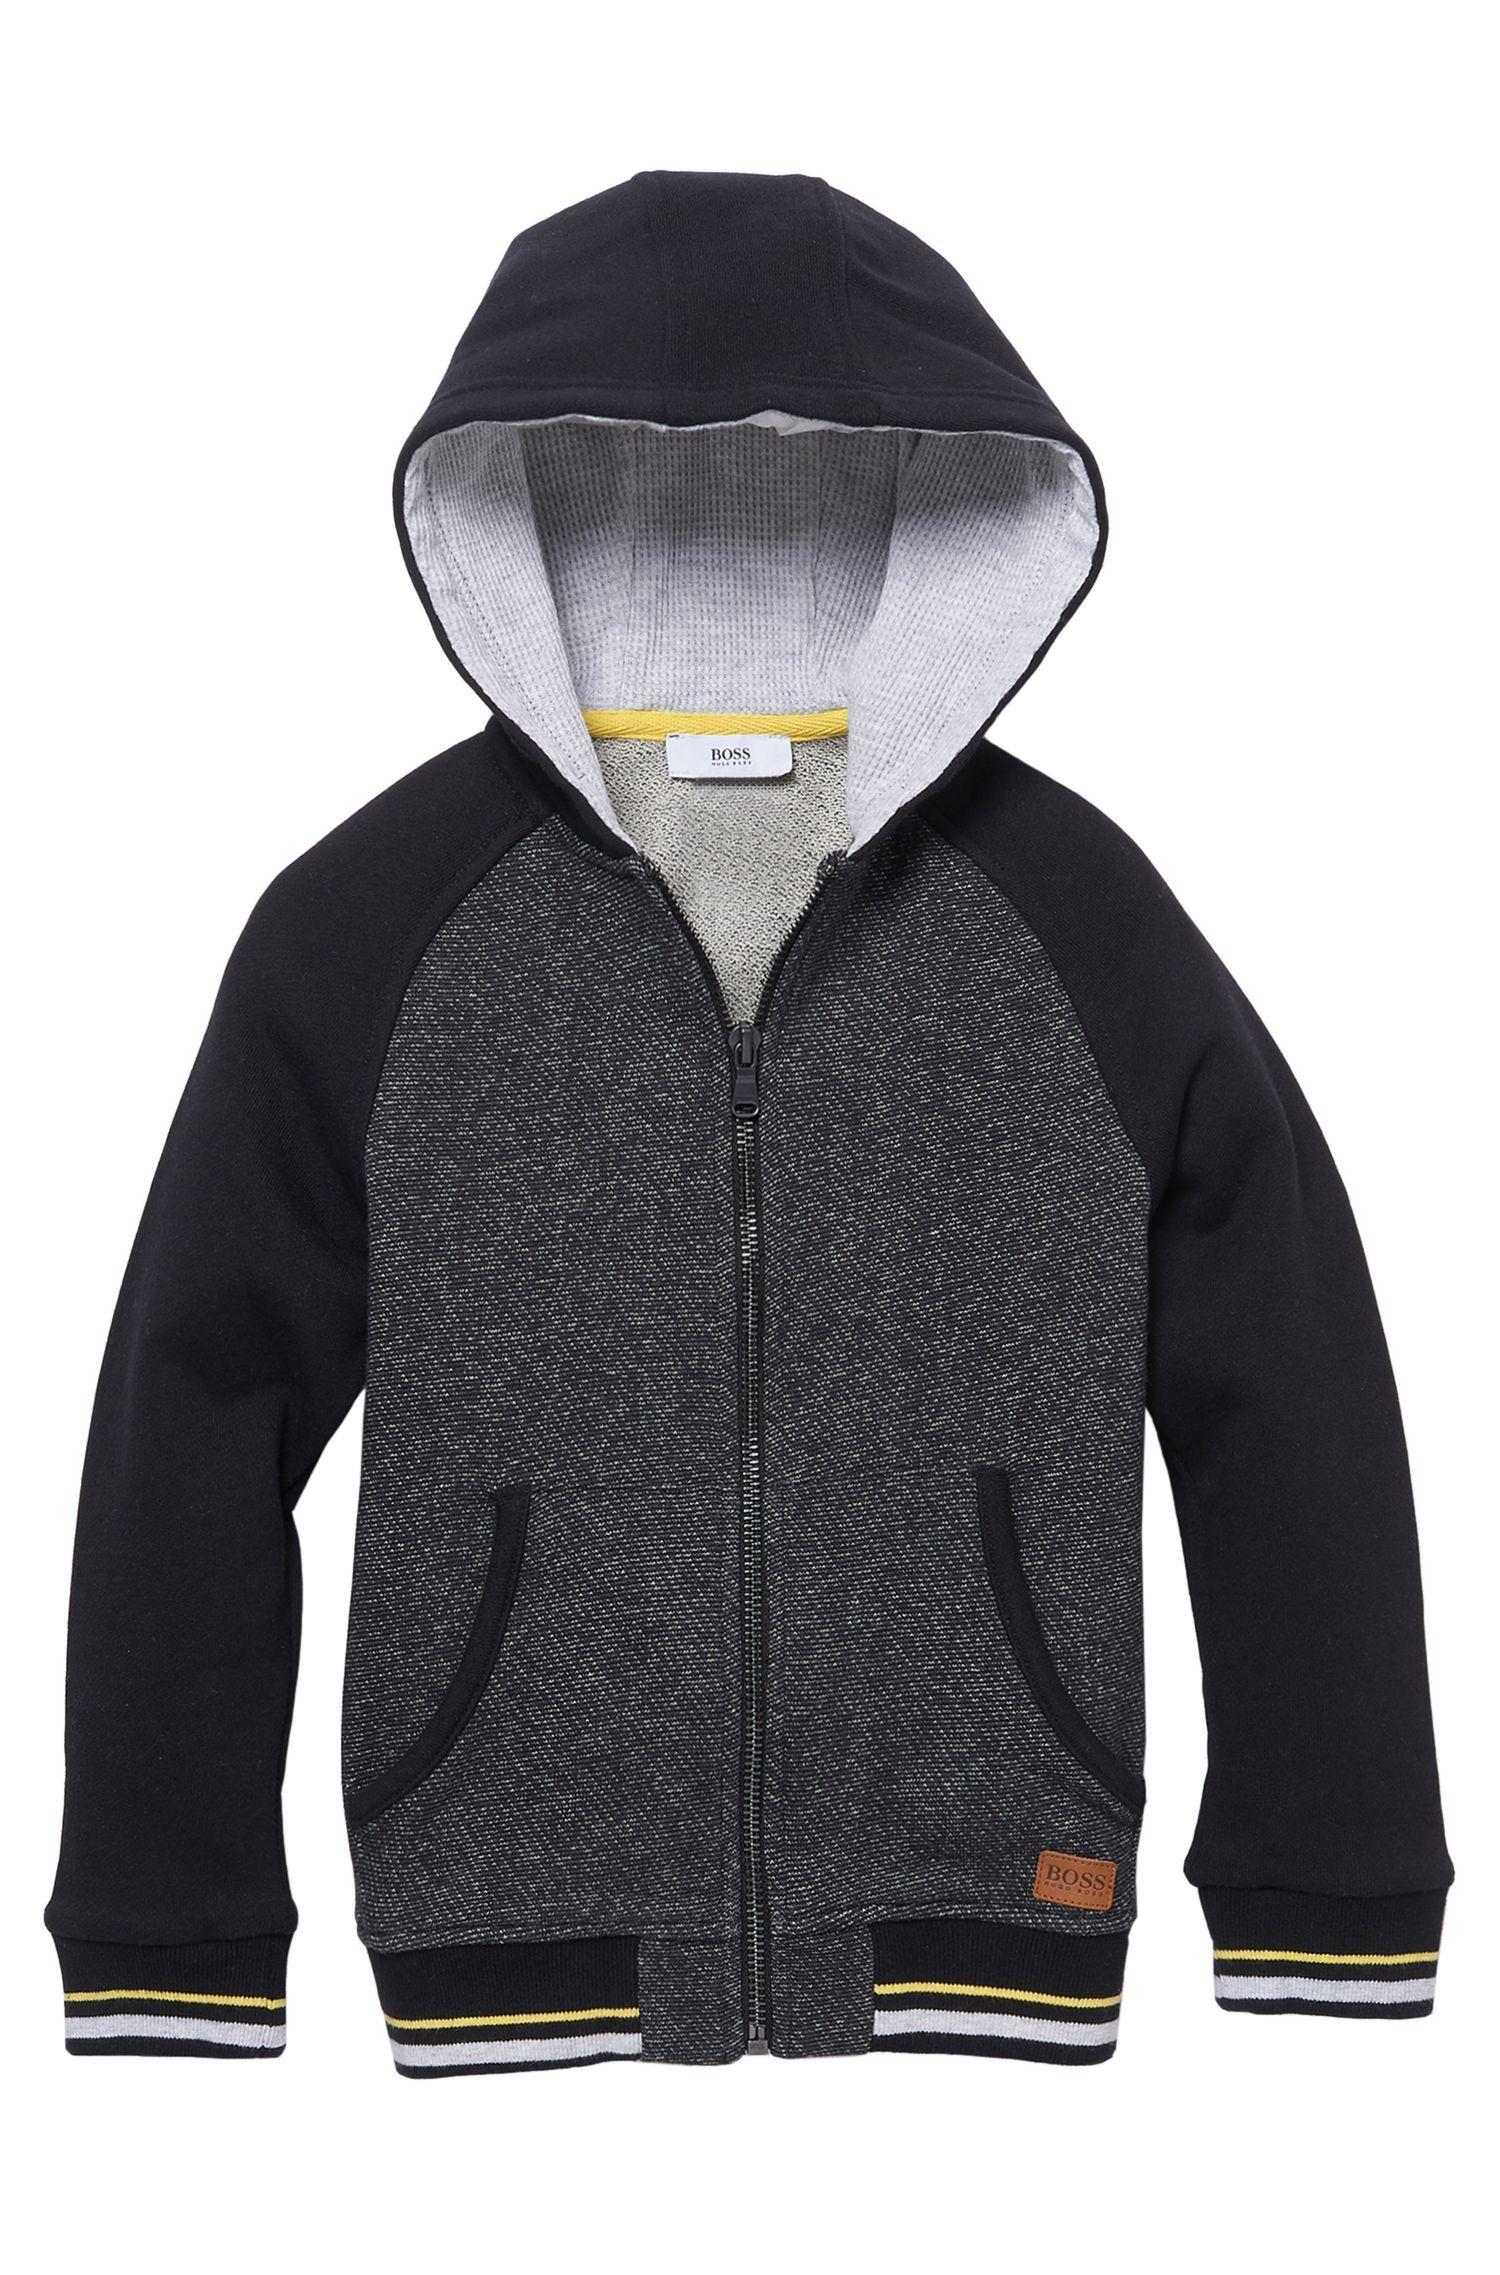 'J25963' | Boys Cotton Jersey Zip Hooded Sweatshirt